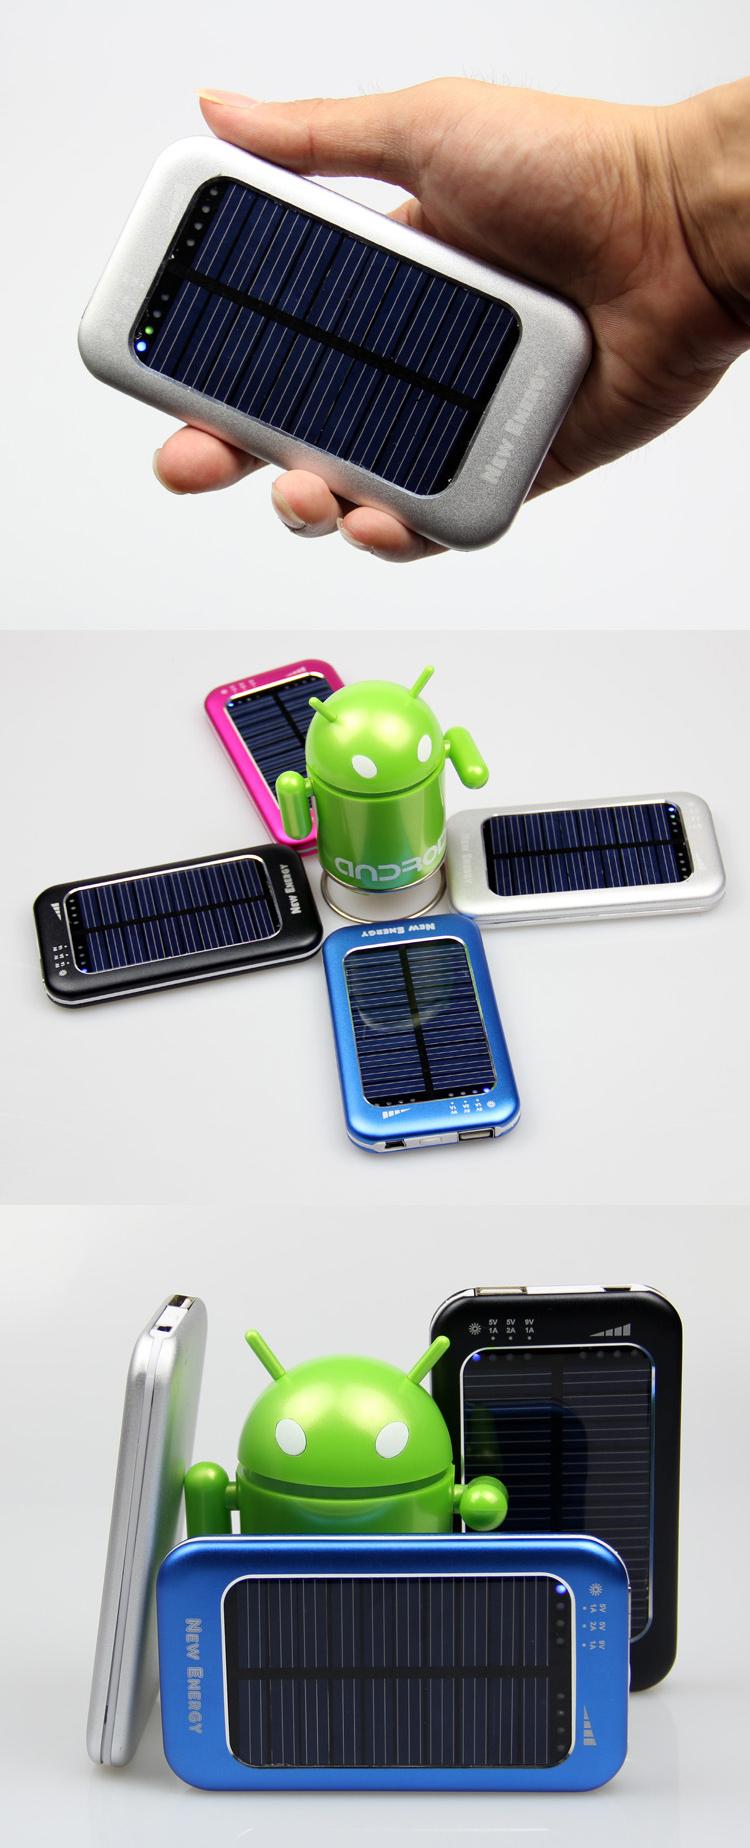 http://www.mg-trading.com/mg-trading/Solar/3500A/1.6.jpg